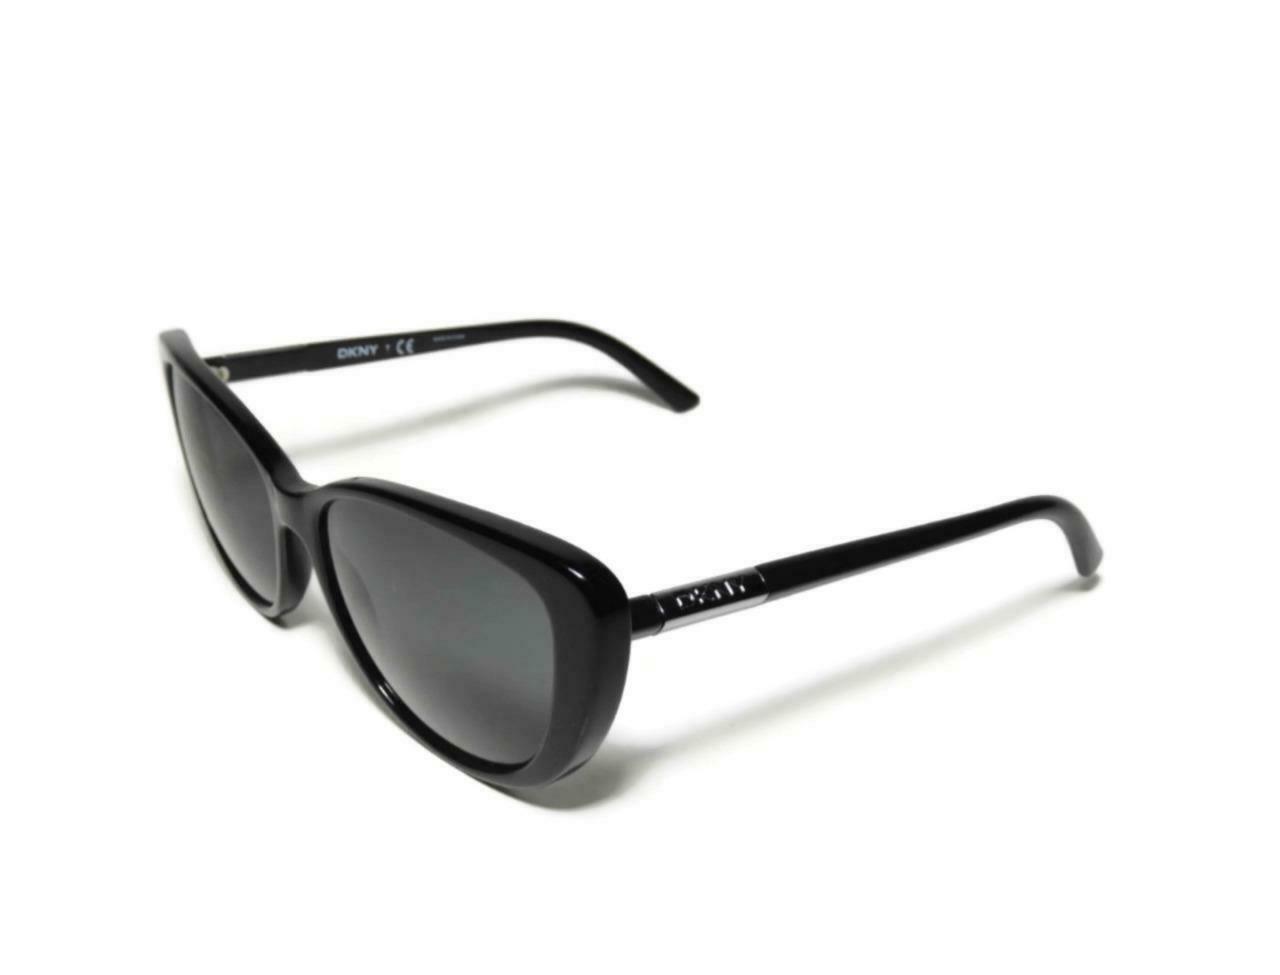 NEW DKNY Donna Karan New York Black Sunglasses DY4121 + Case - $79.99